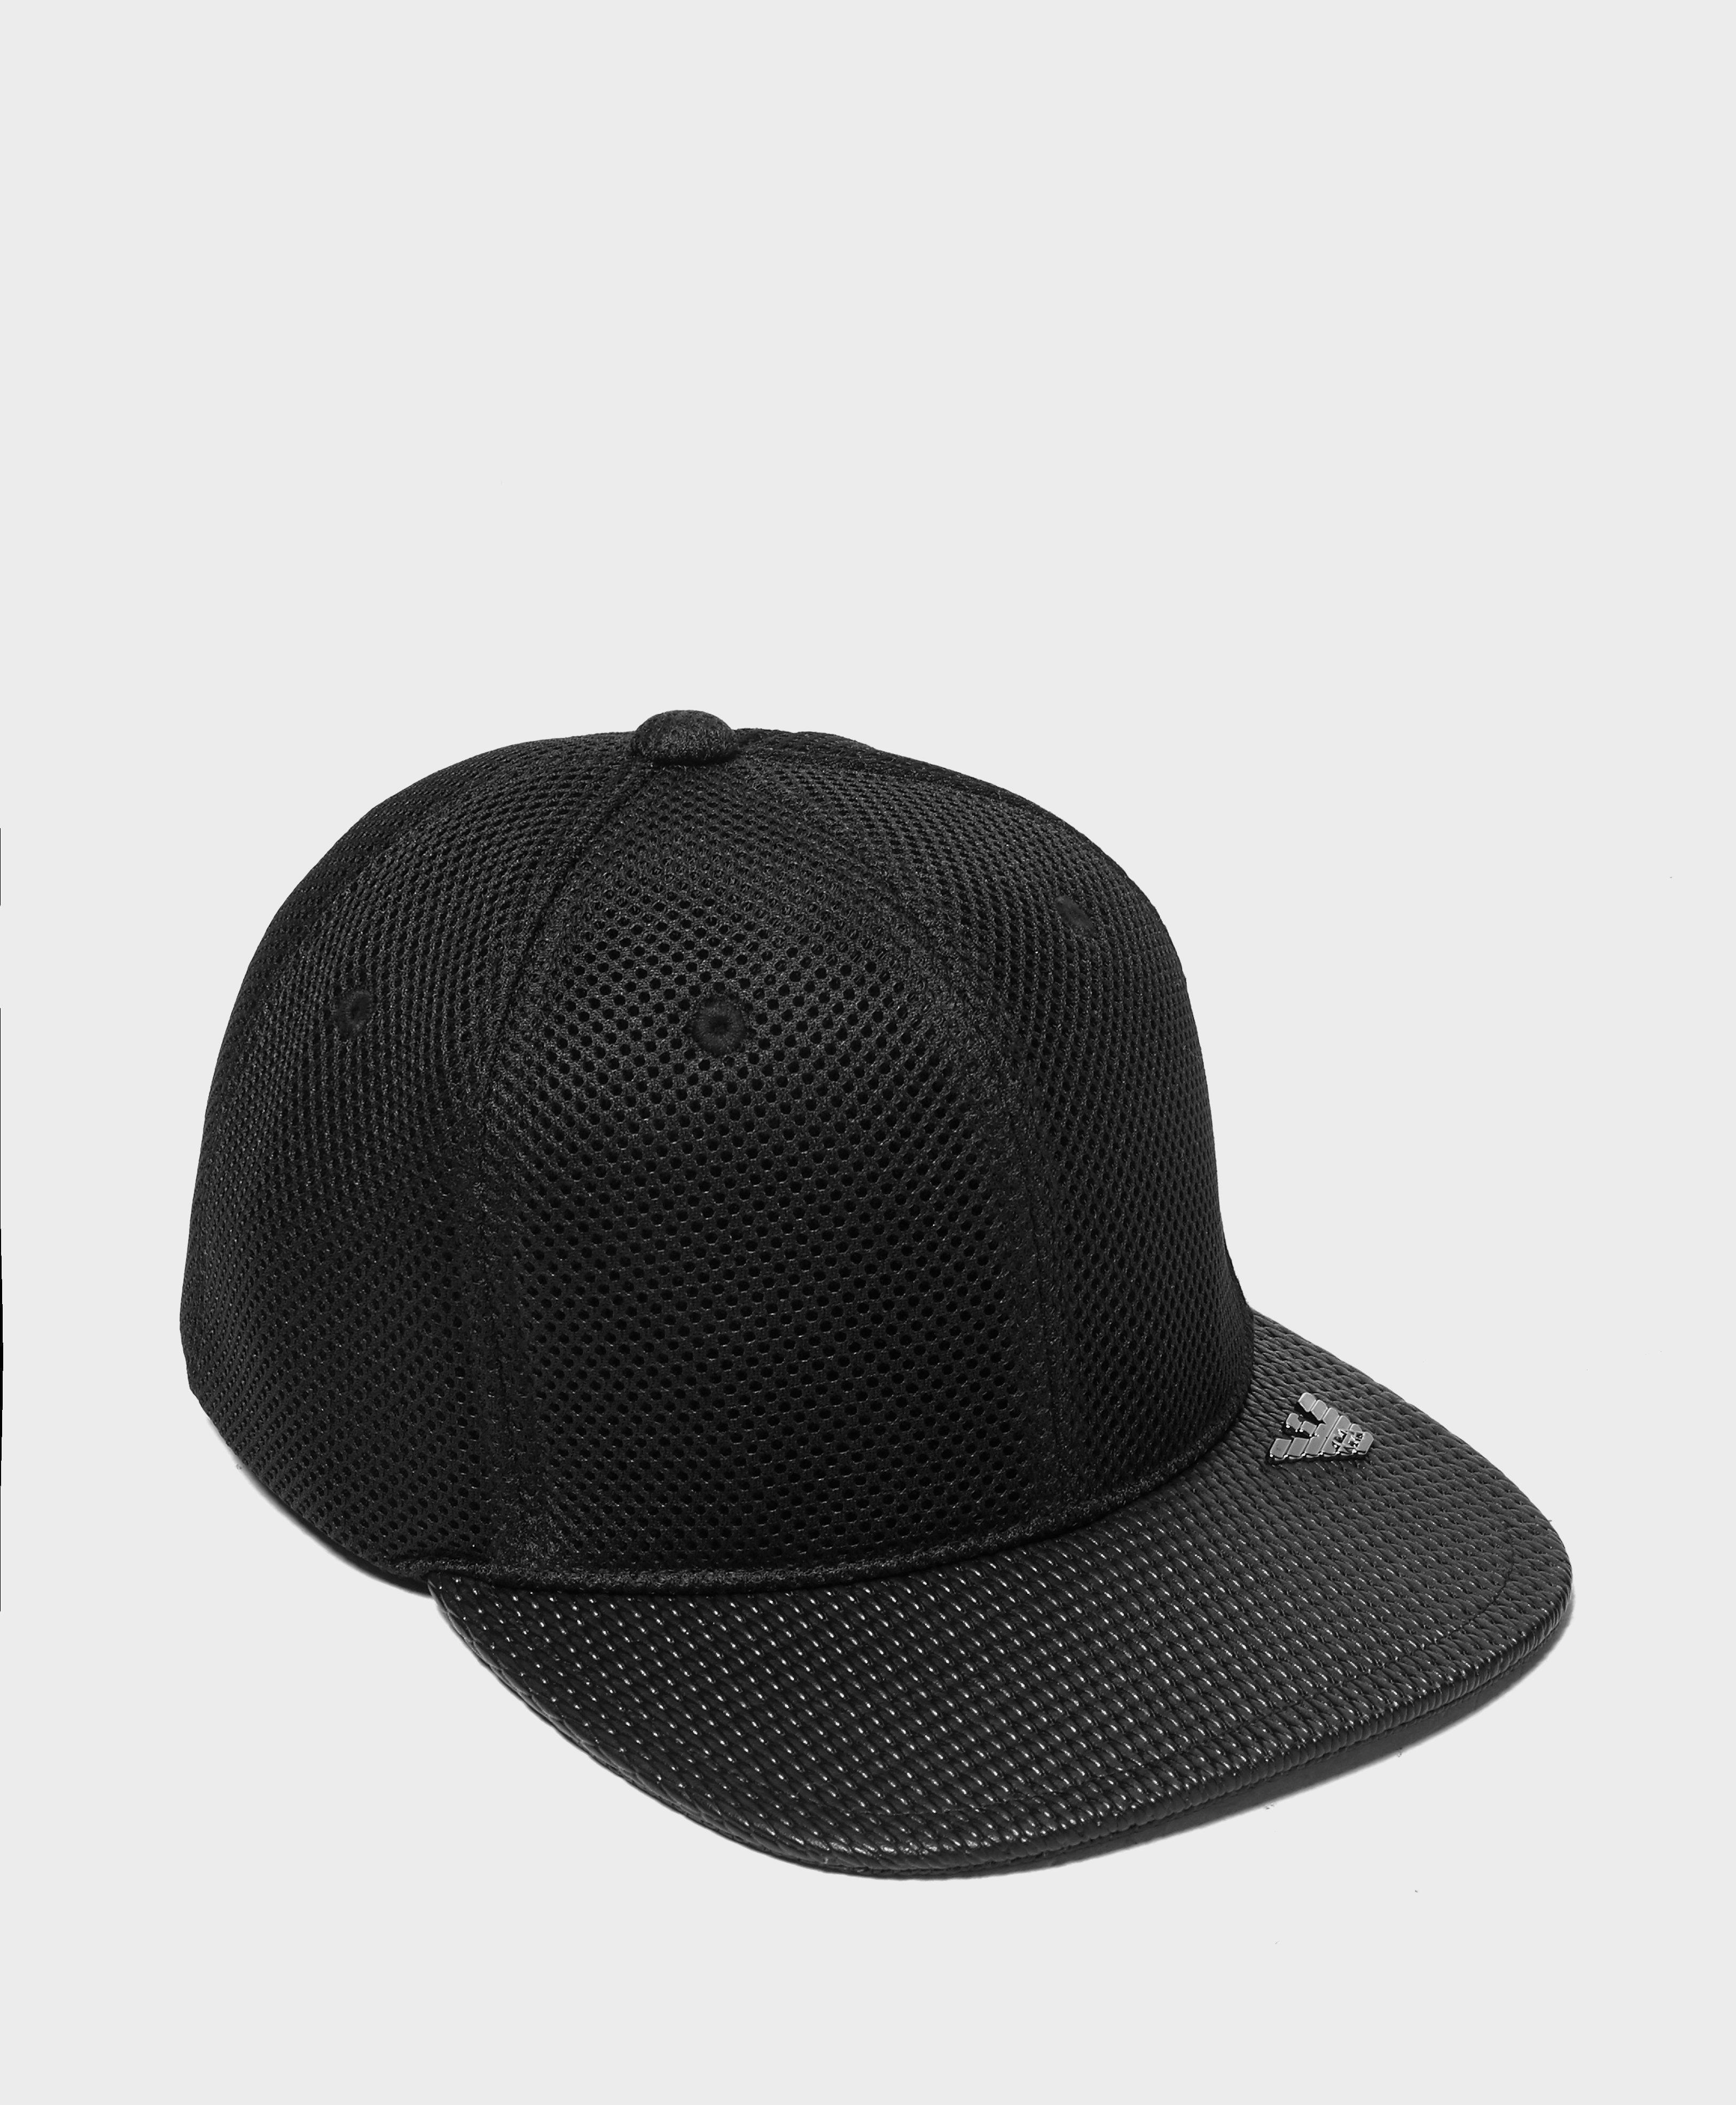 2d5fafc606b Lyst - Armani Jeans Mesh Cap in Black for Men